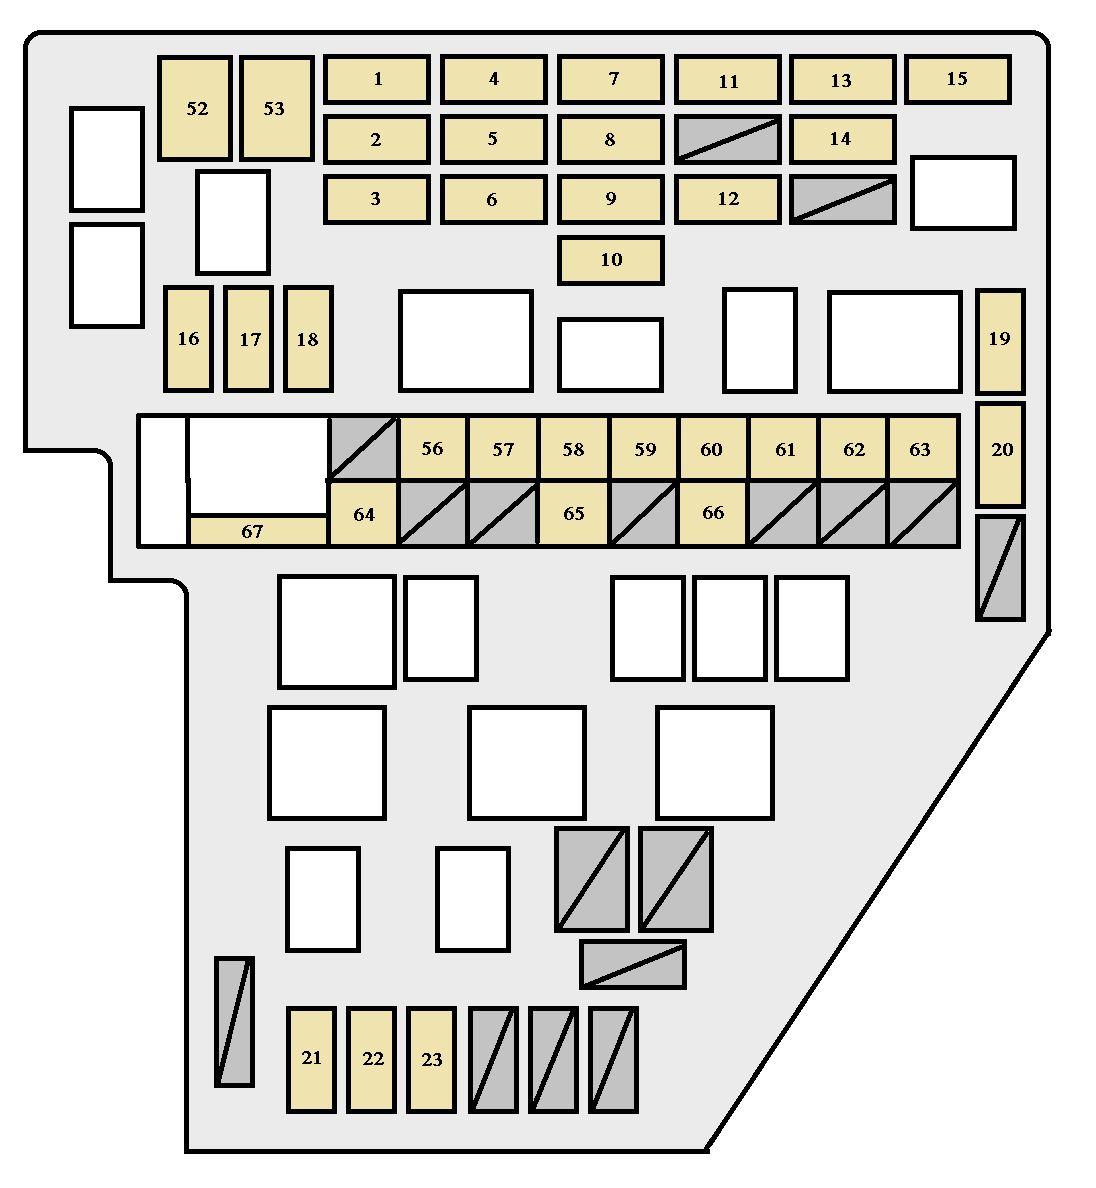 2006 toyota sienna fuse diagram